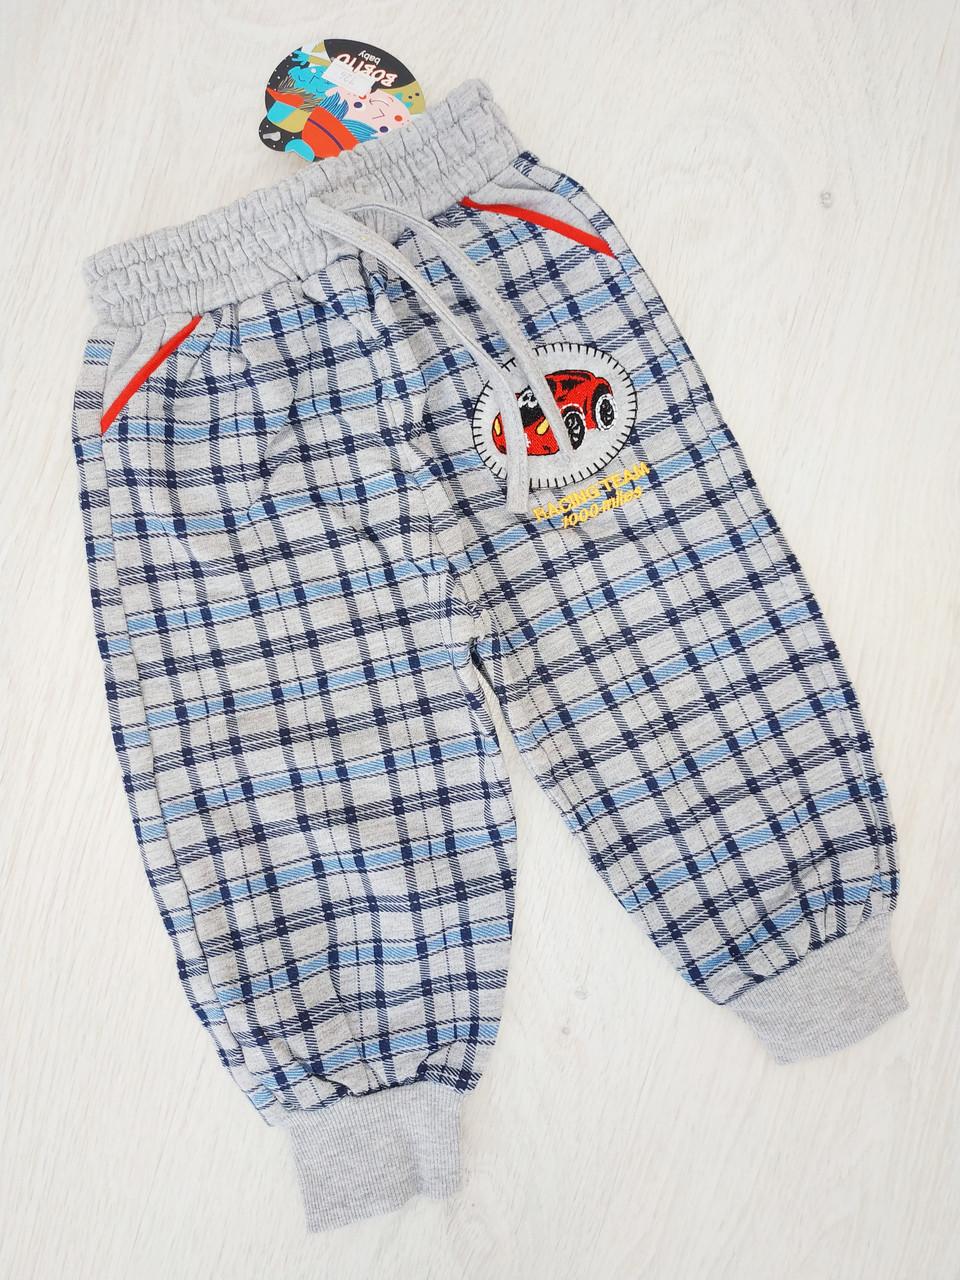 Спорт брюки для мальчика, Турция, Babexi, рр. 74, арт. 38461